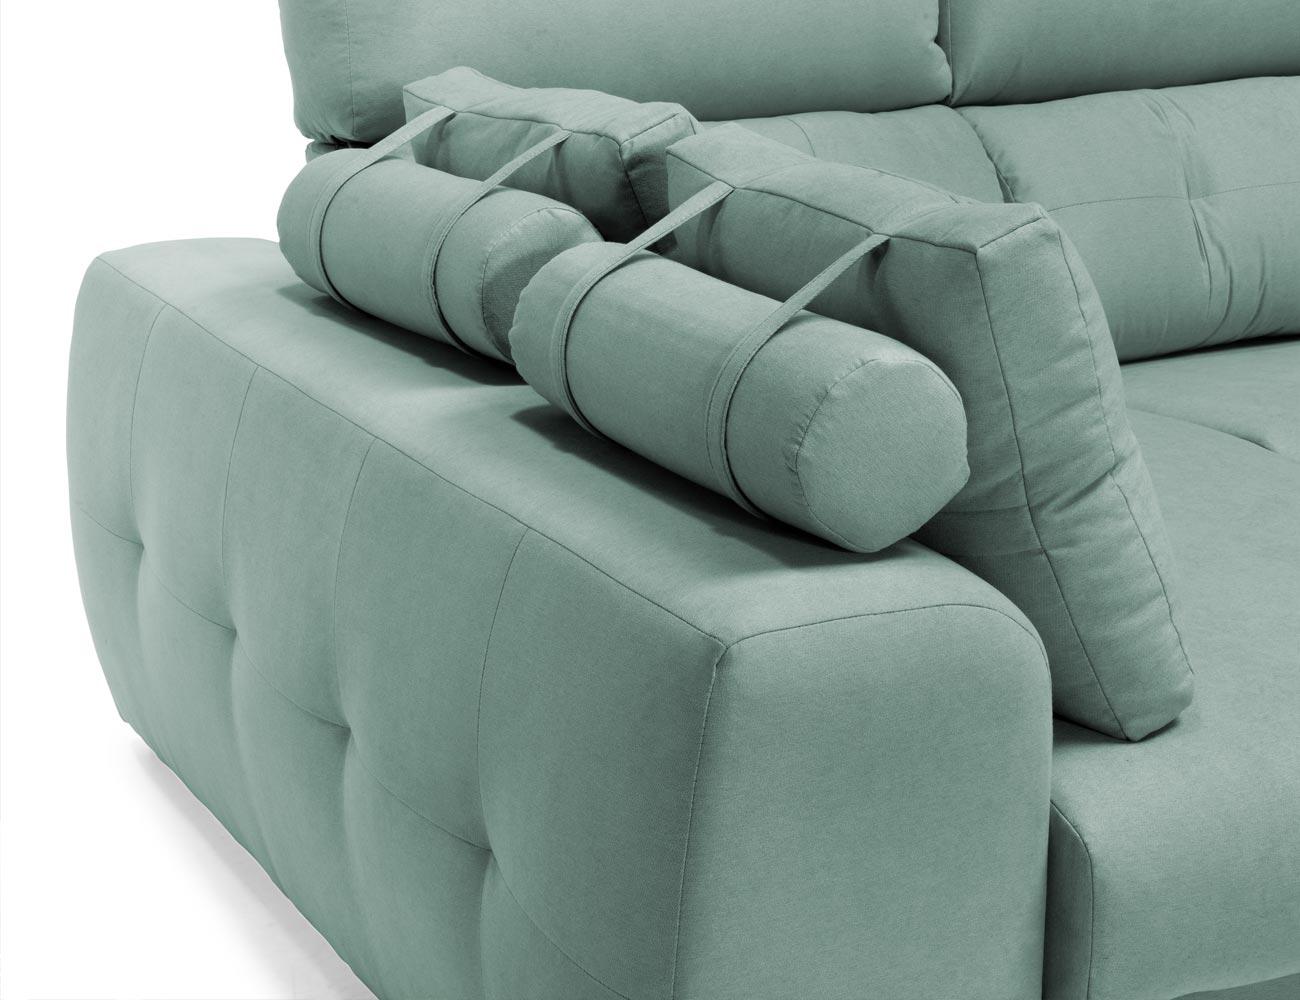 Sofa chaiselongue valetta detalle